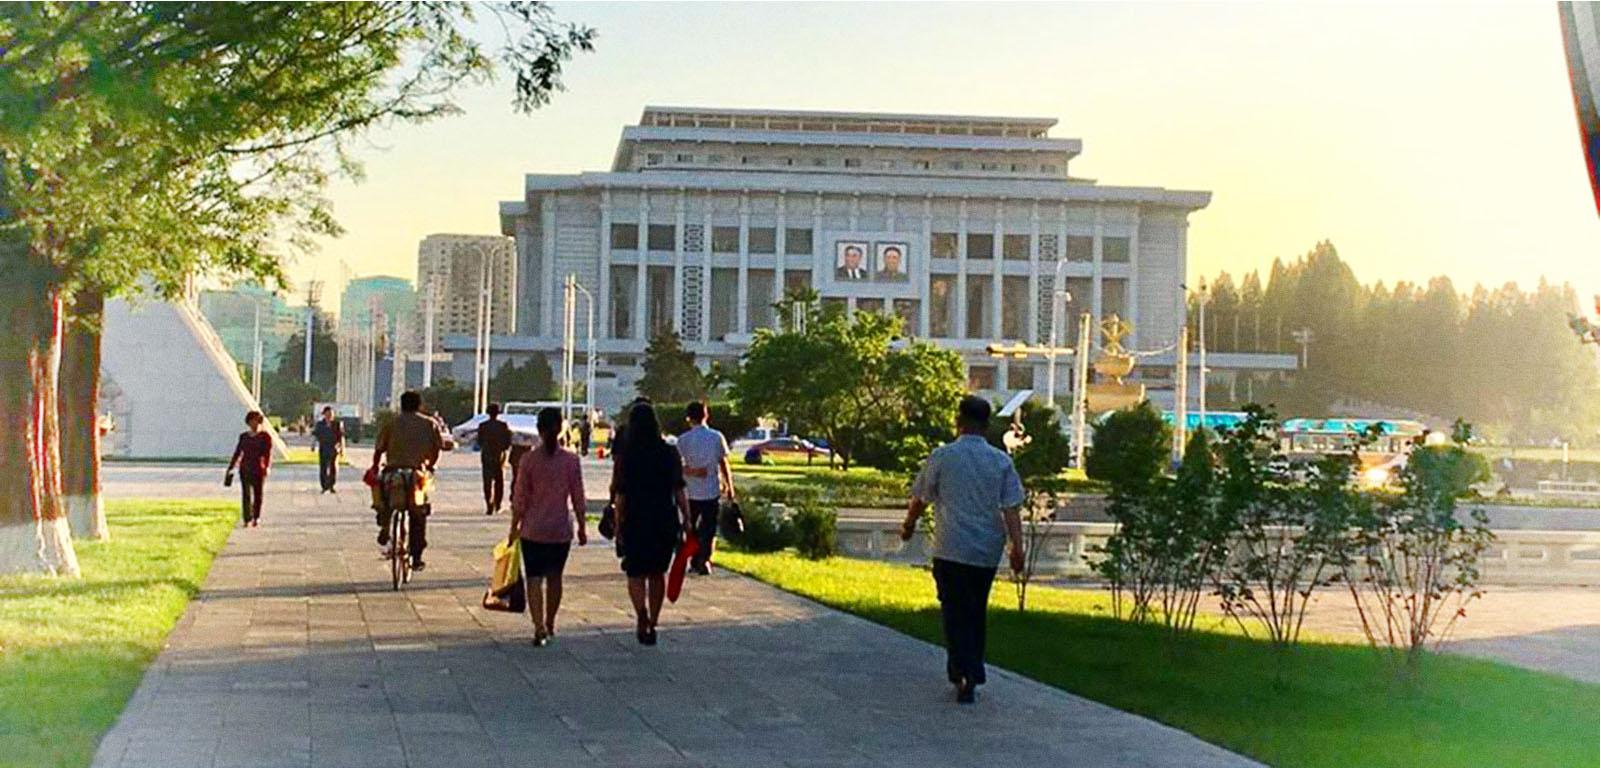 North Korea - peace amidst the chaos